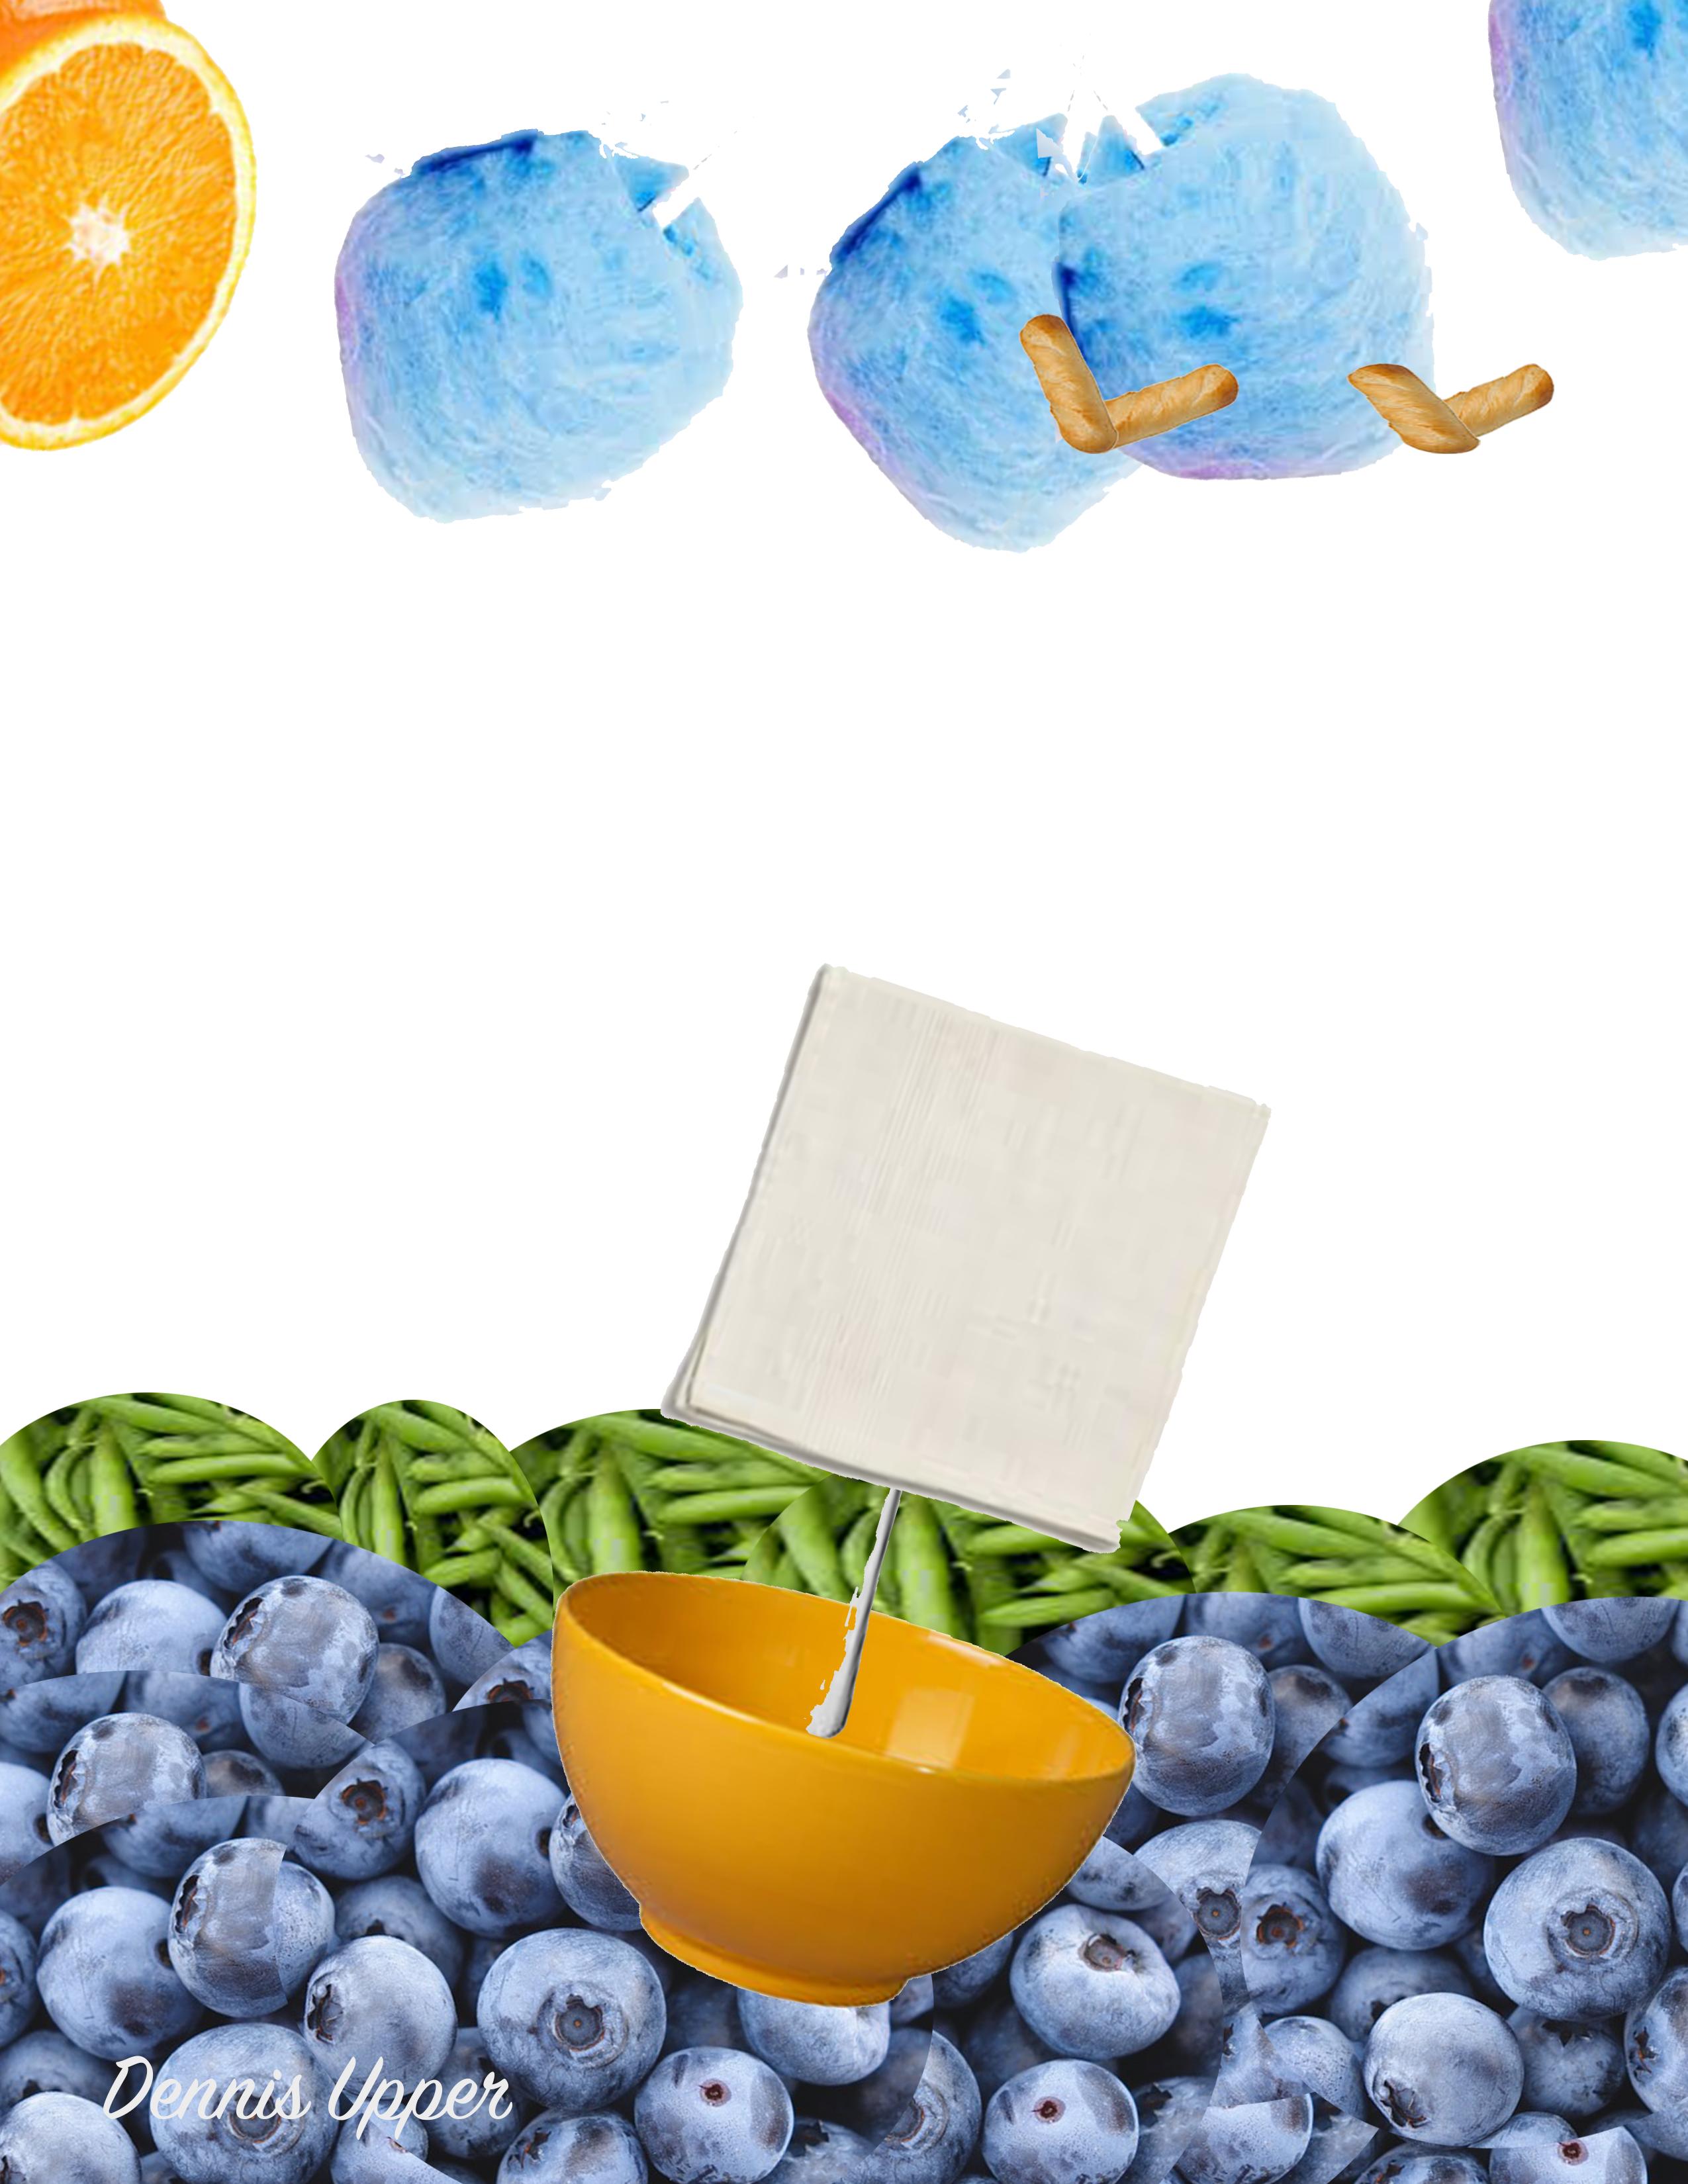 dennis_Food Collage